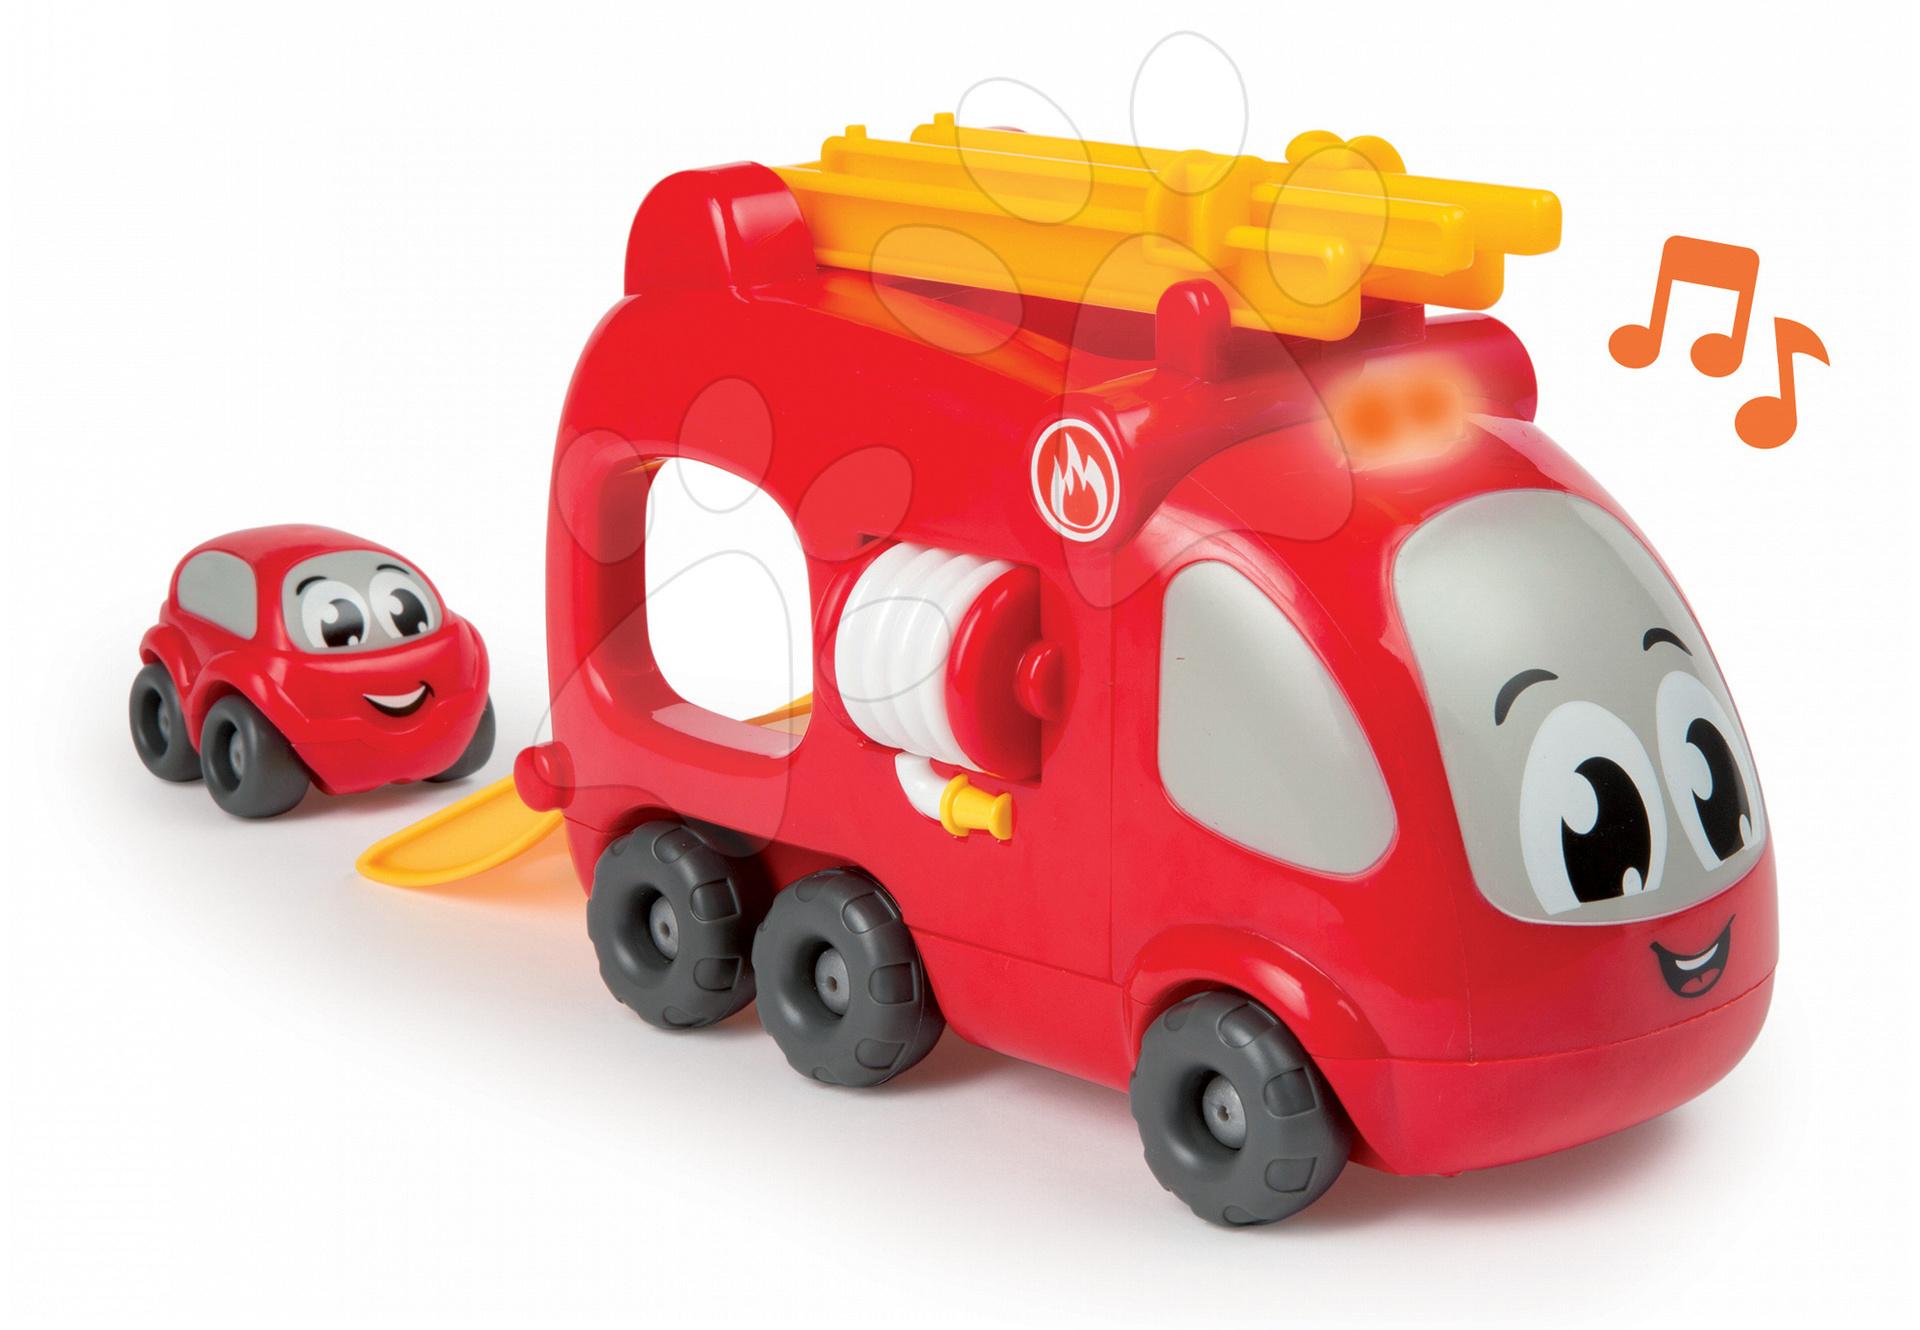 Garáže - Hasičské auto Smoby elektronické s autíčkom dĺžka 21 cm od 12 mes